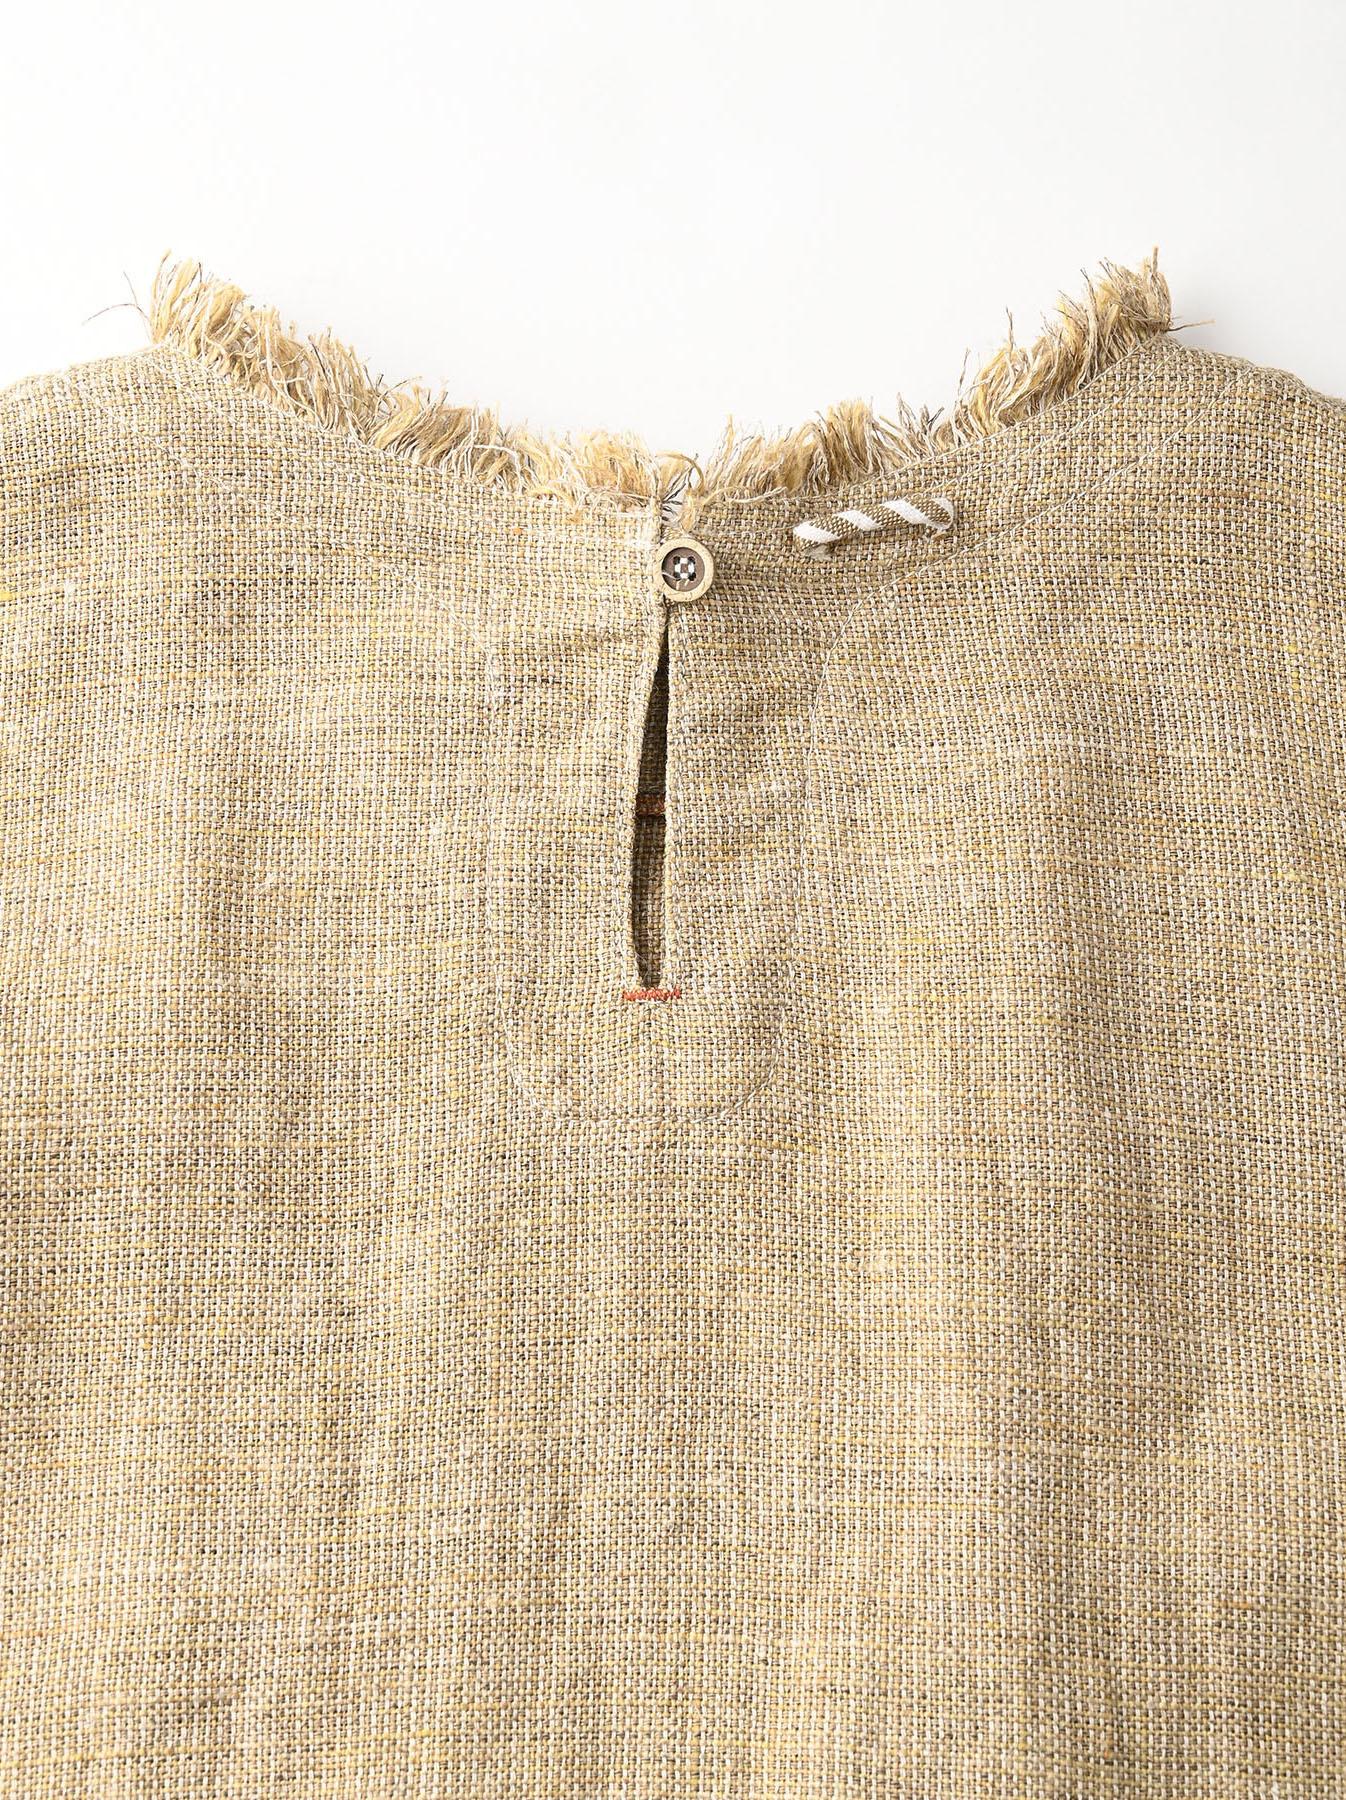 Gima Tweed Leilei Embroidery Dress-12